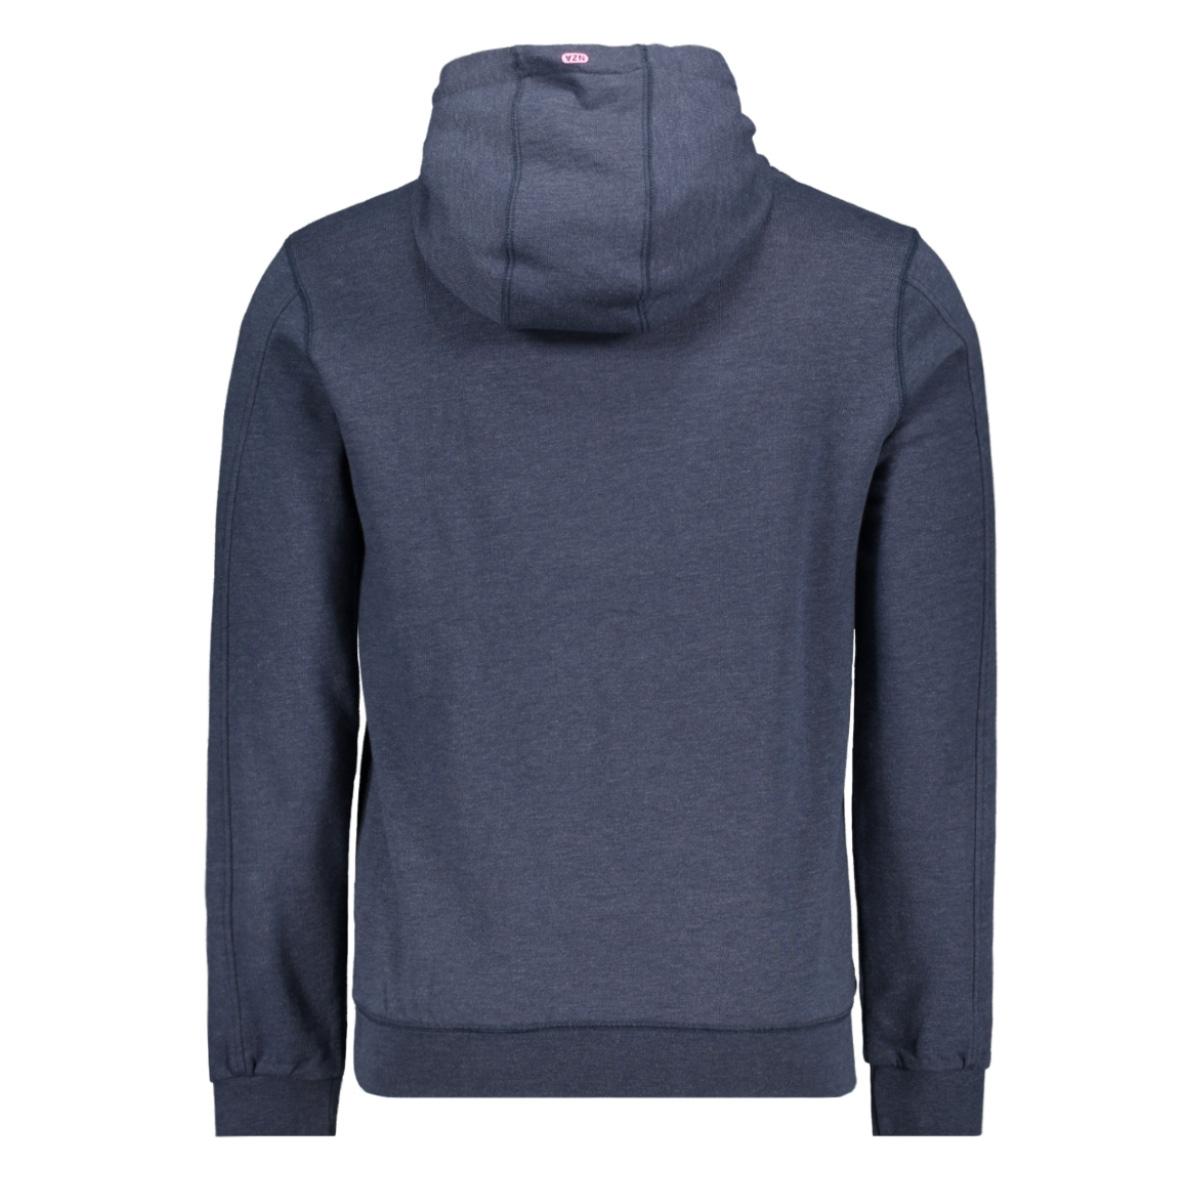 havelock north 19bn307 nza sweater 282 marine blue